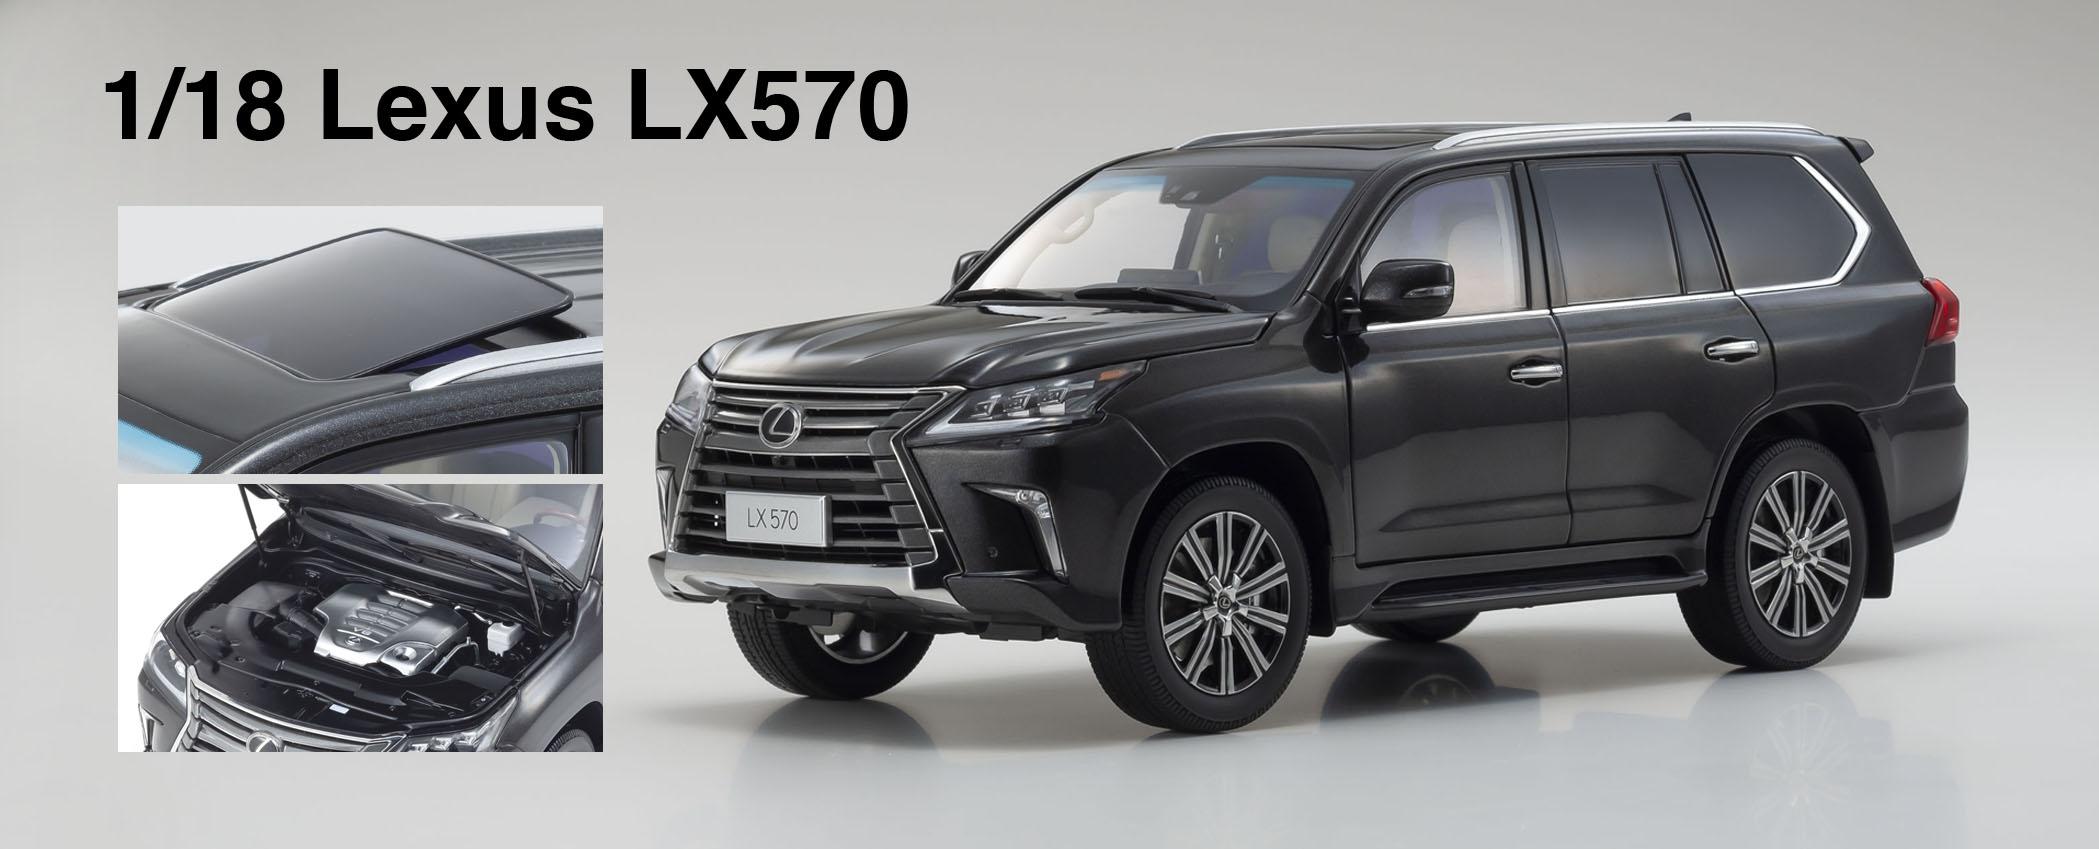 lexus LX570 series